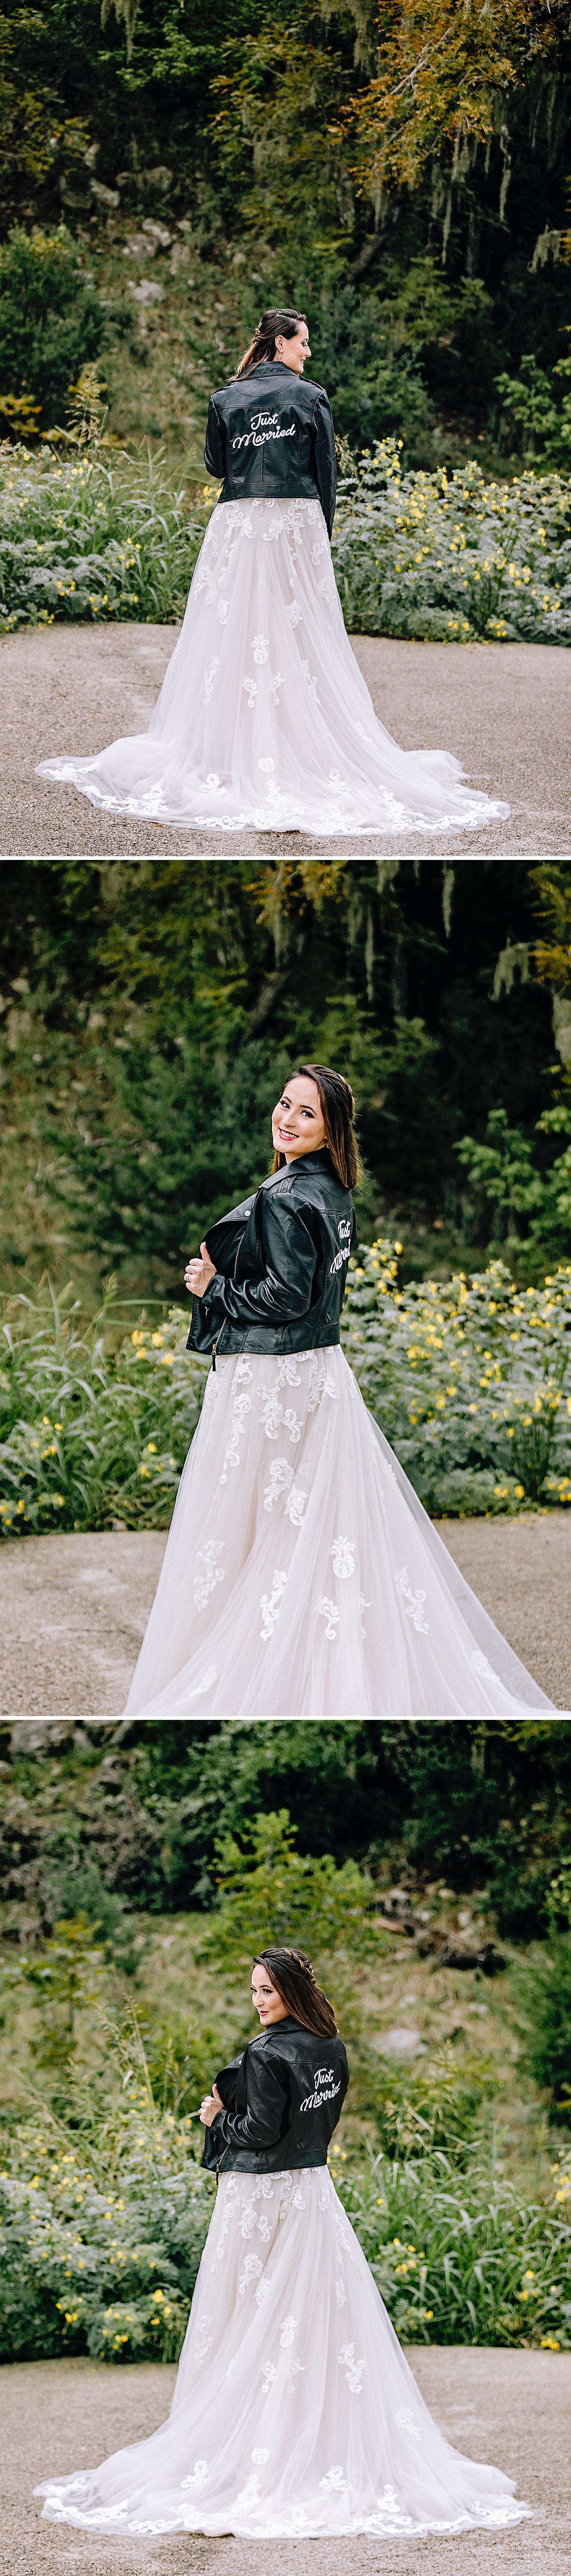 Carly-Barton-Photography-Bridal-Photos-Remis-Ridge-Hidden-Falls-New-Braunfels-Texas-Bride_0011.jpg